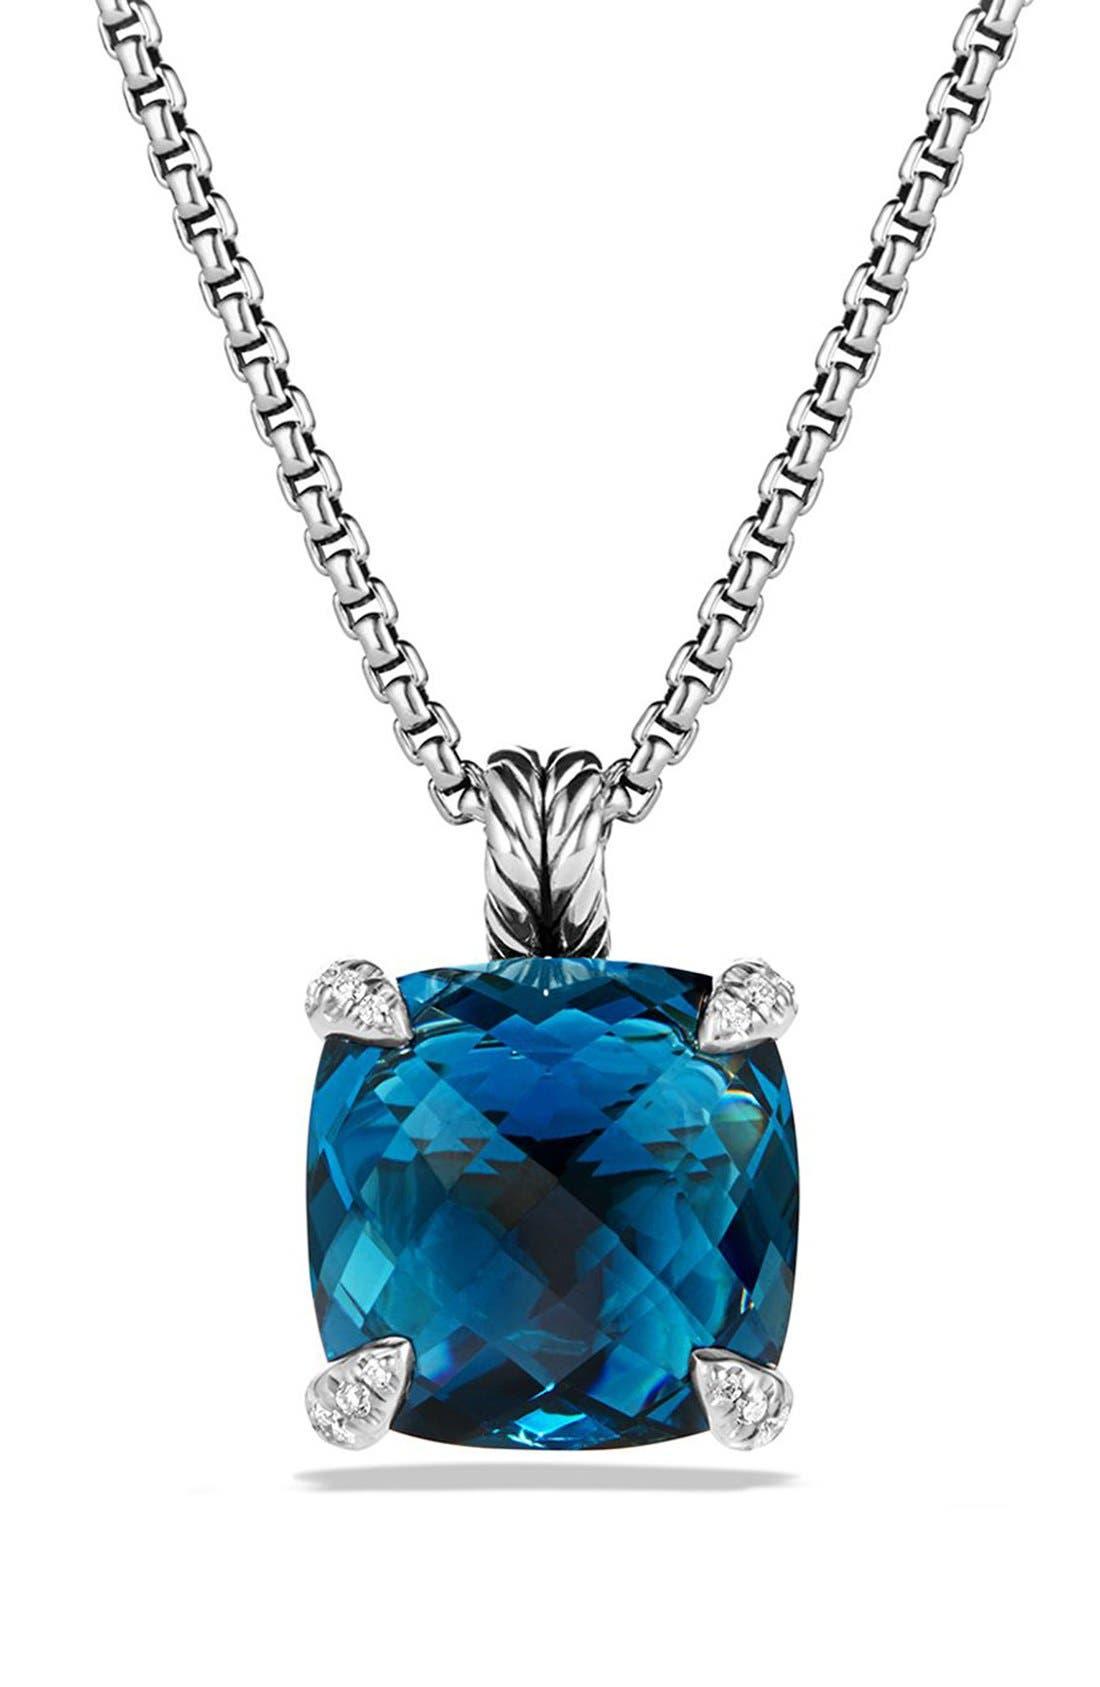 Main Image - David Yurman 'Châtelaine' Pendant Necklace with Semiprecious Stone and Diamonds